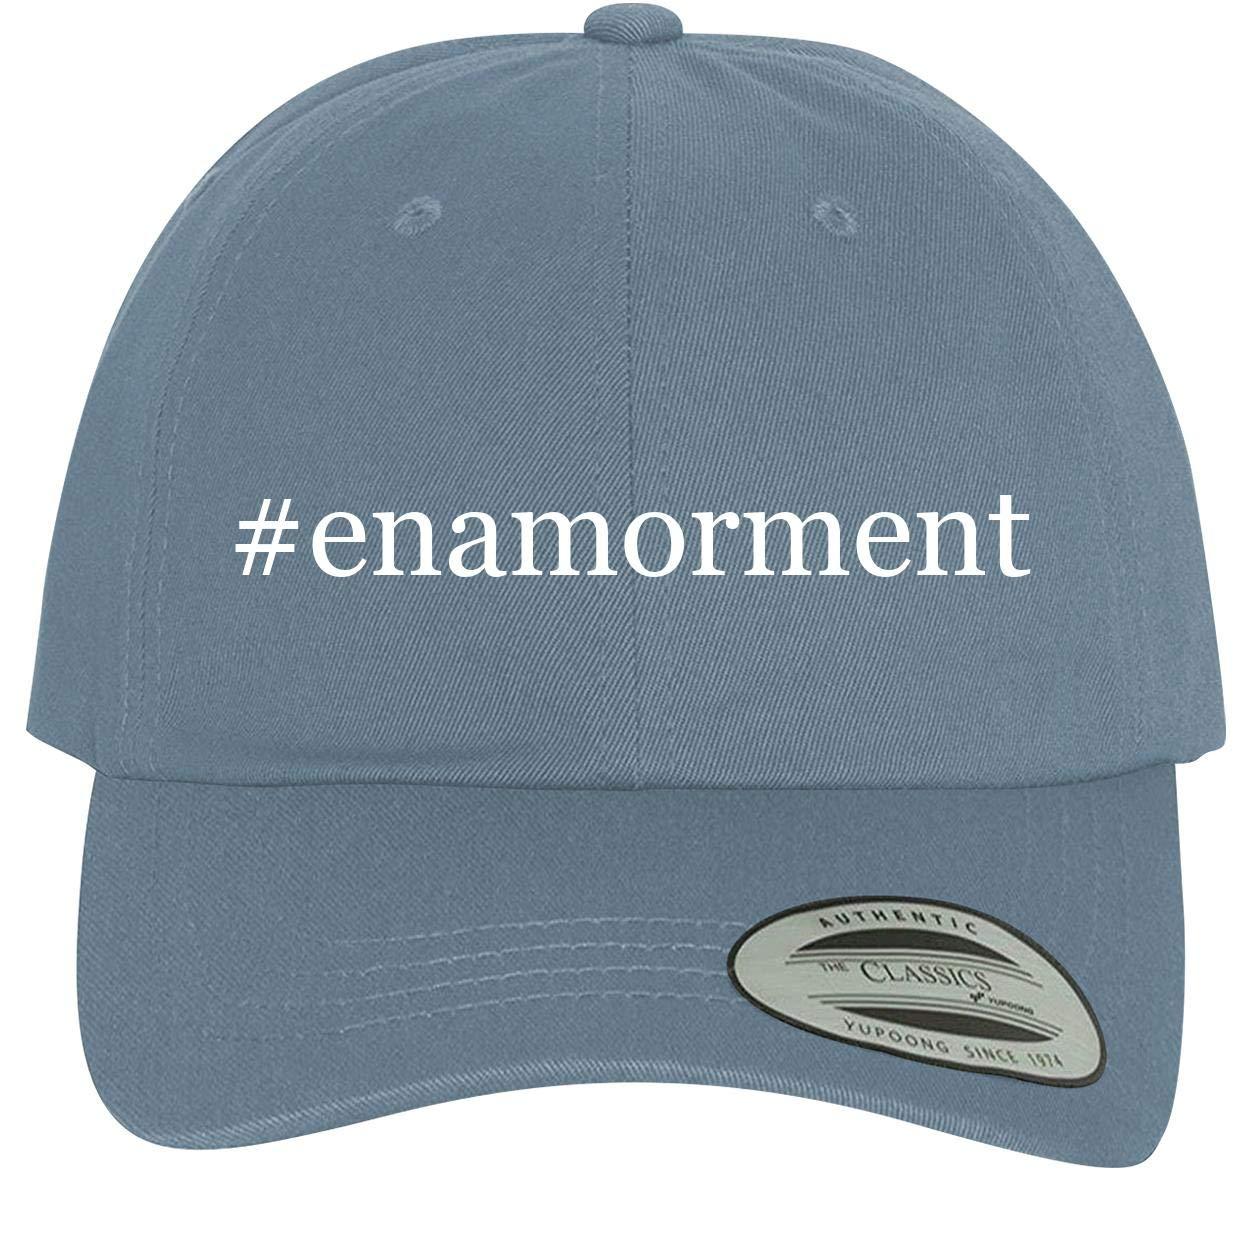 Comfortable Dad Hat Baseball Cap BH Cool Designs #Enamorment